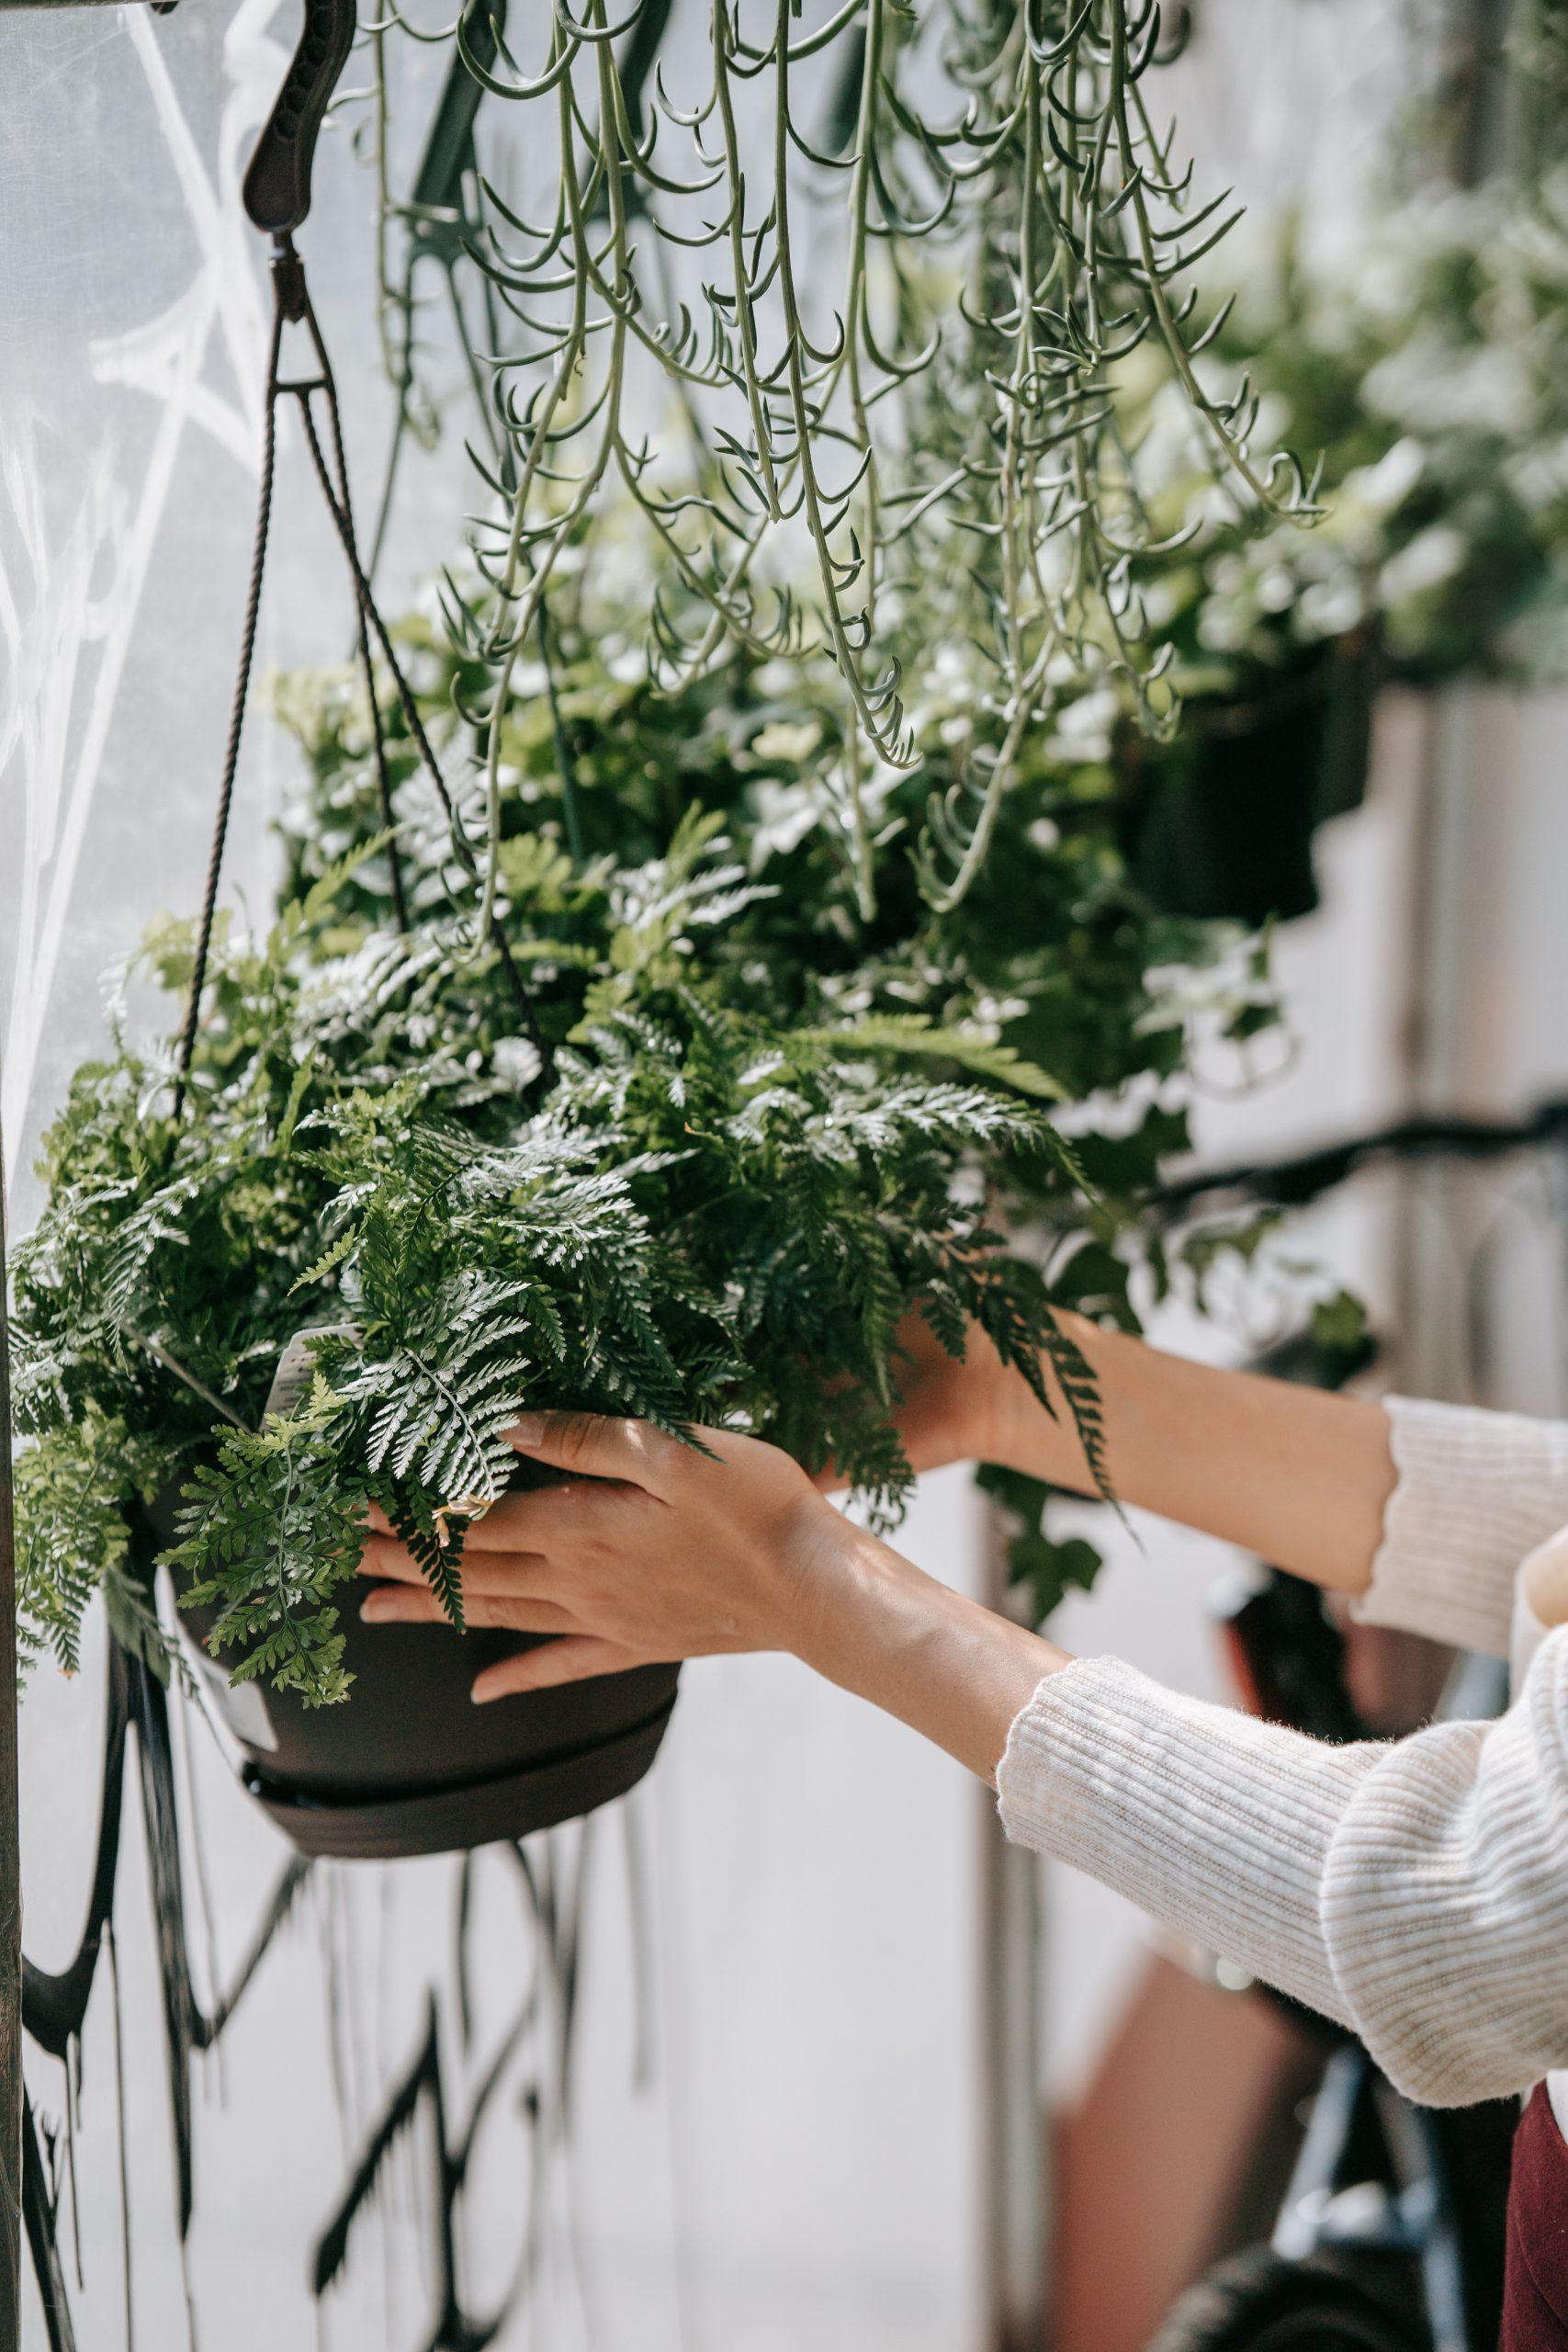 How to Repot Nephrolepis exaltata houseplants?